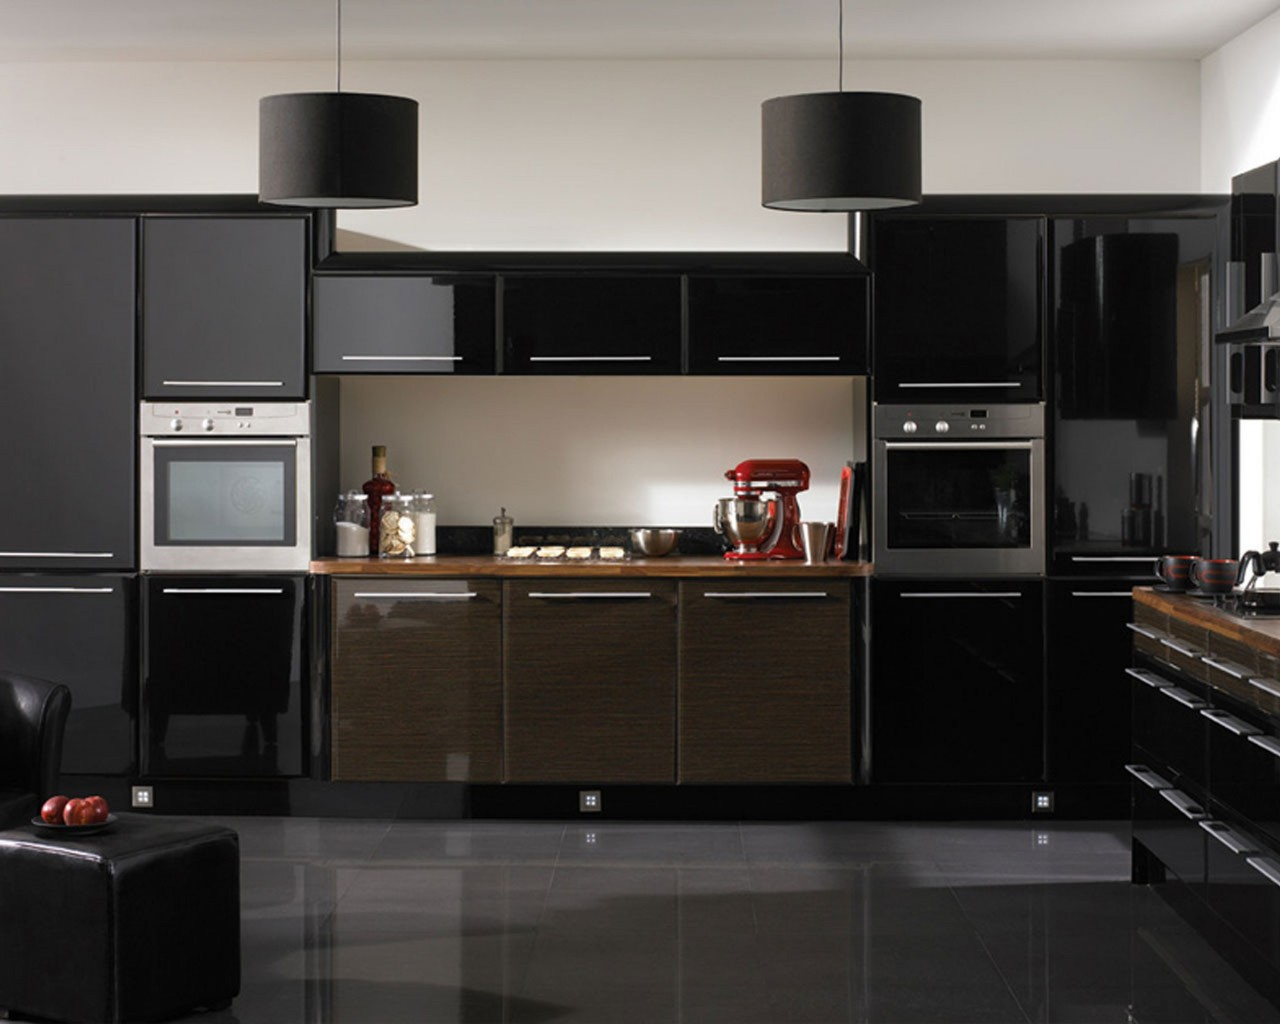 Black sweet Kitchen Cabinets Design Seductive furniture design Awesome kitchen cabinet door ideas Futuristic Style 1280x1024